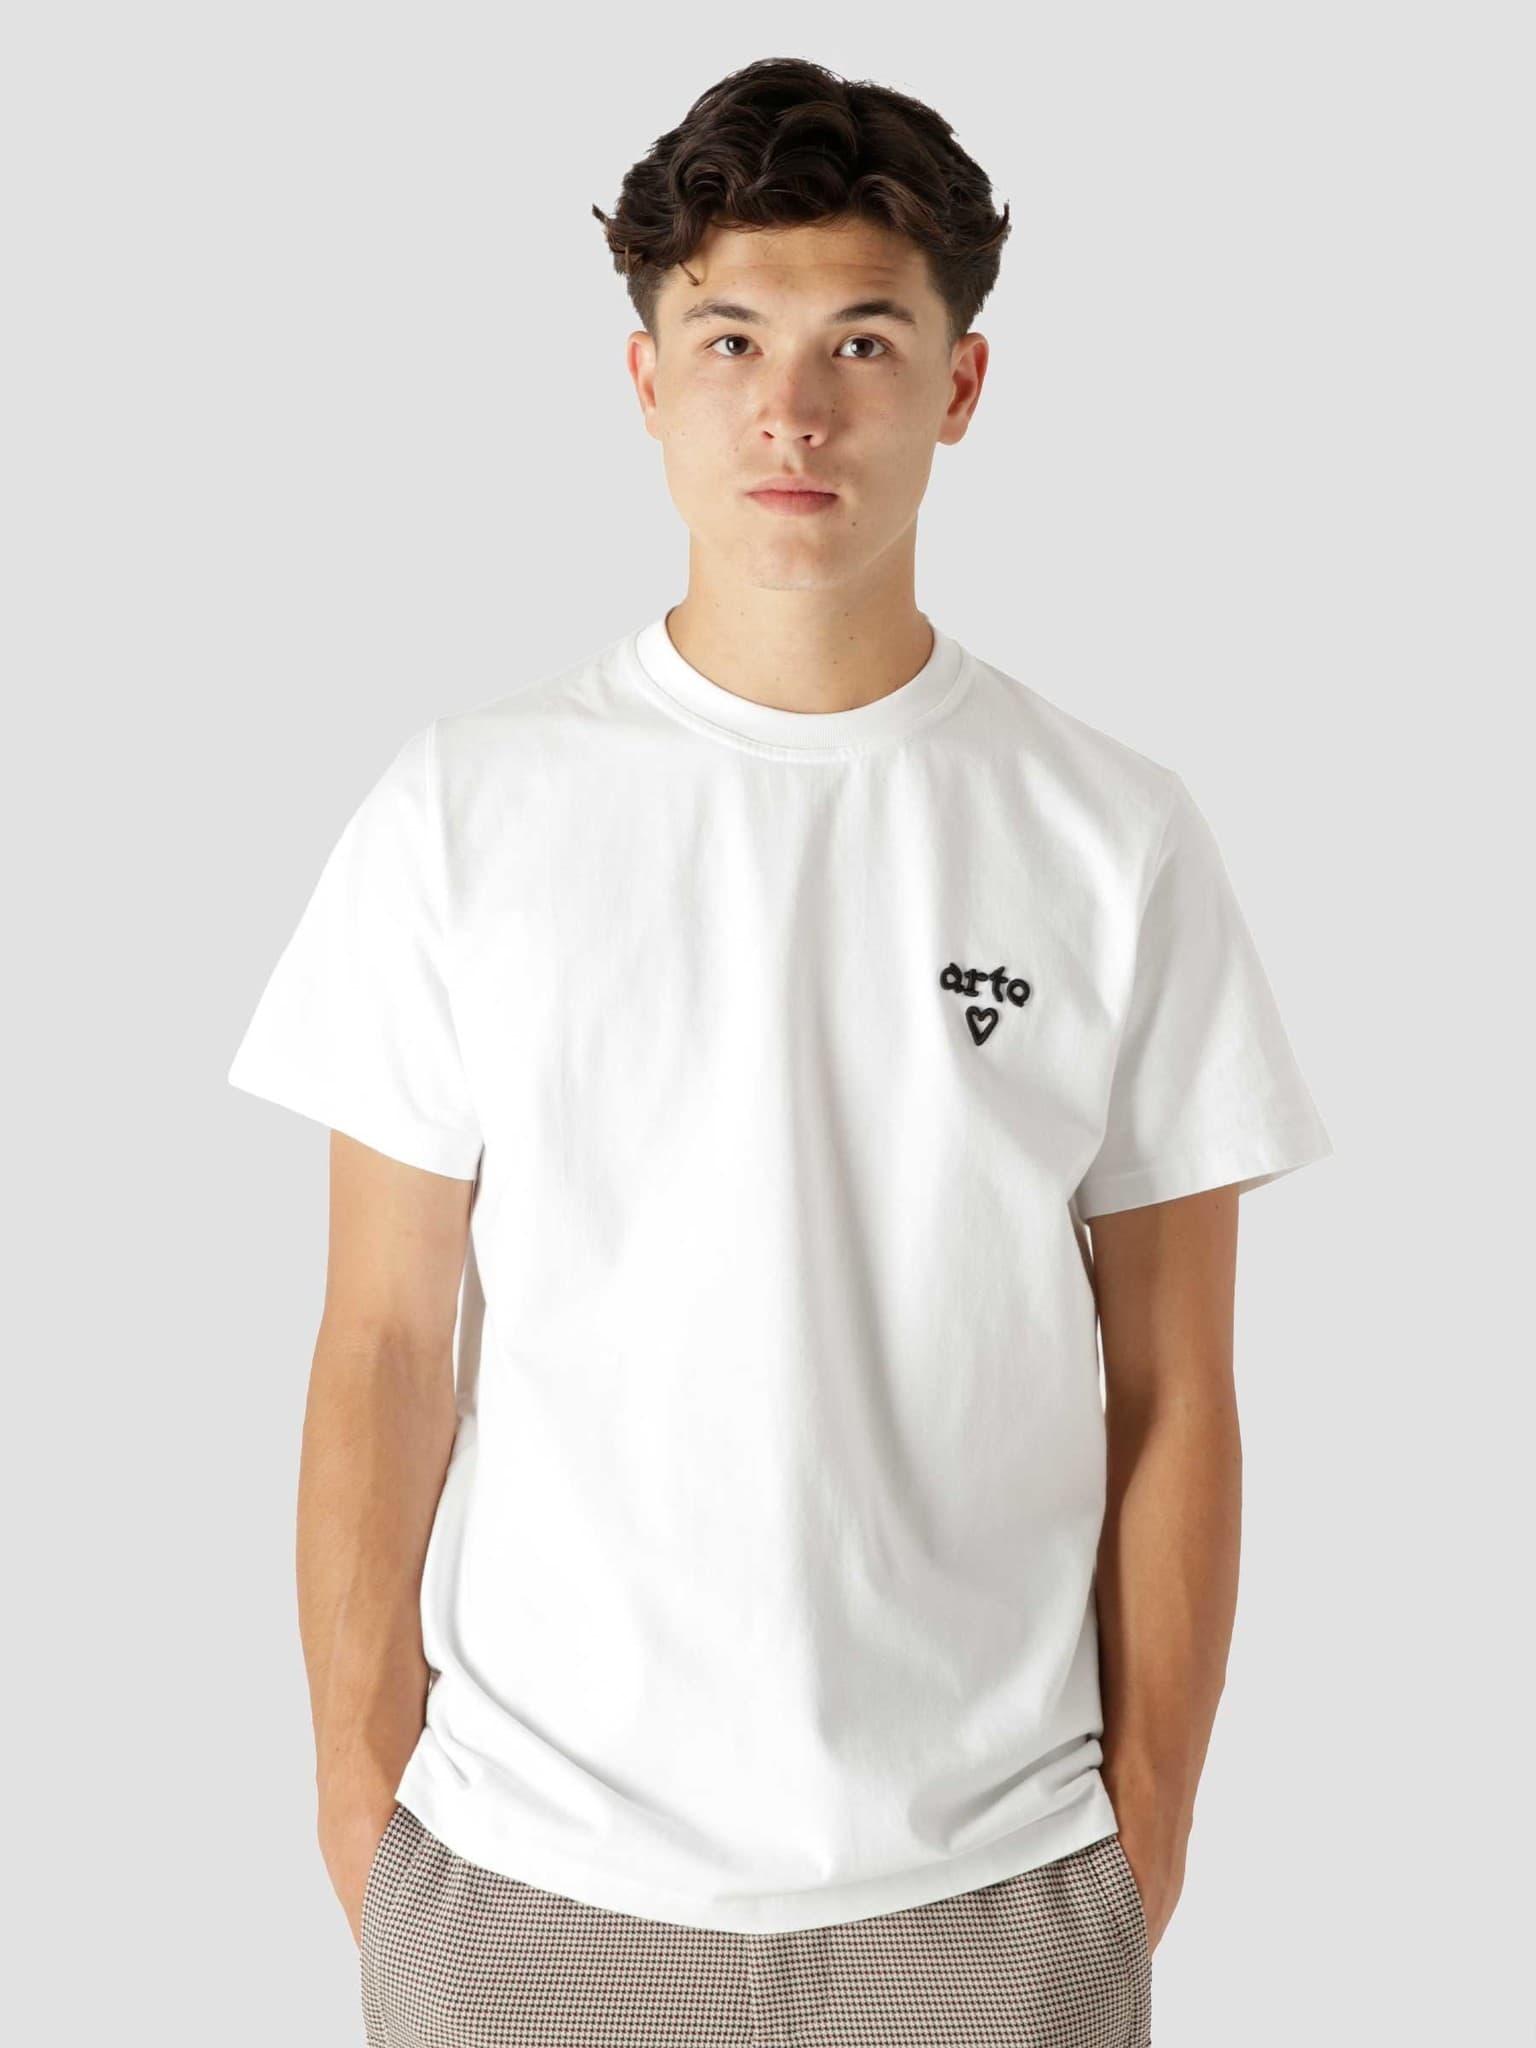 Tissot Heart T-Shirt White AW21-067T